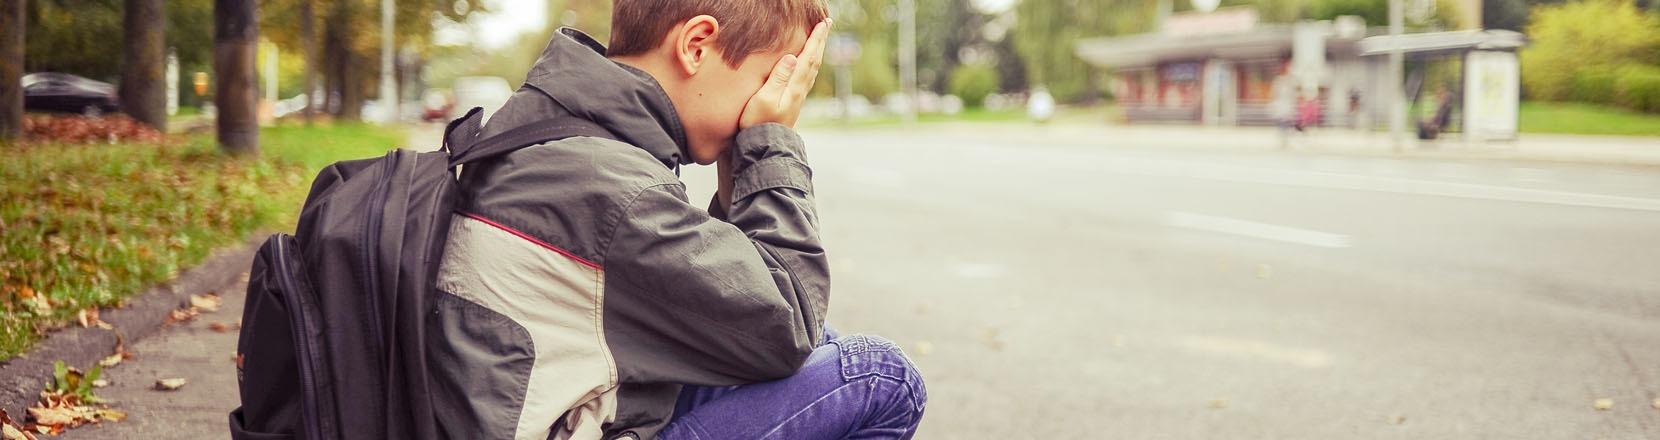 Ragazzino triste piange seduto sul marciapiede, scarsa autostima